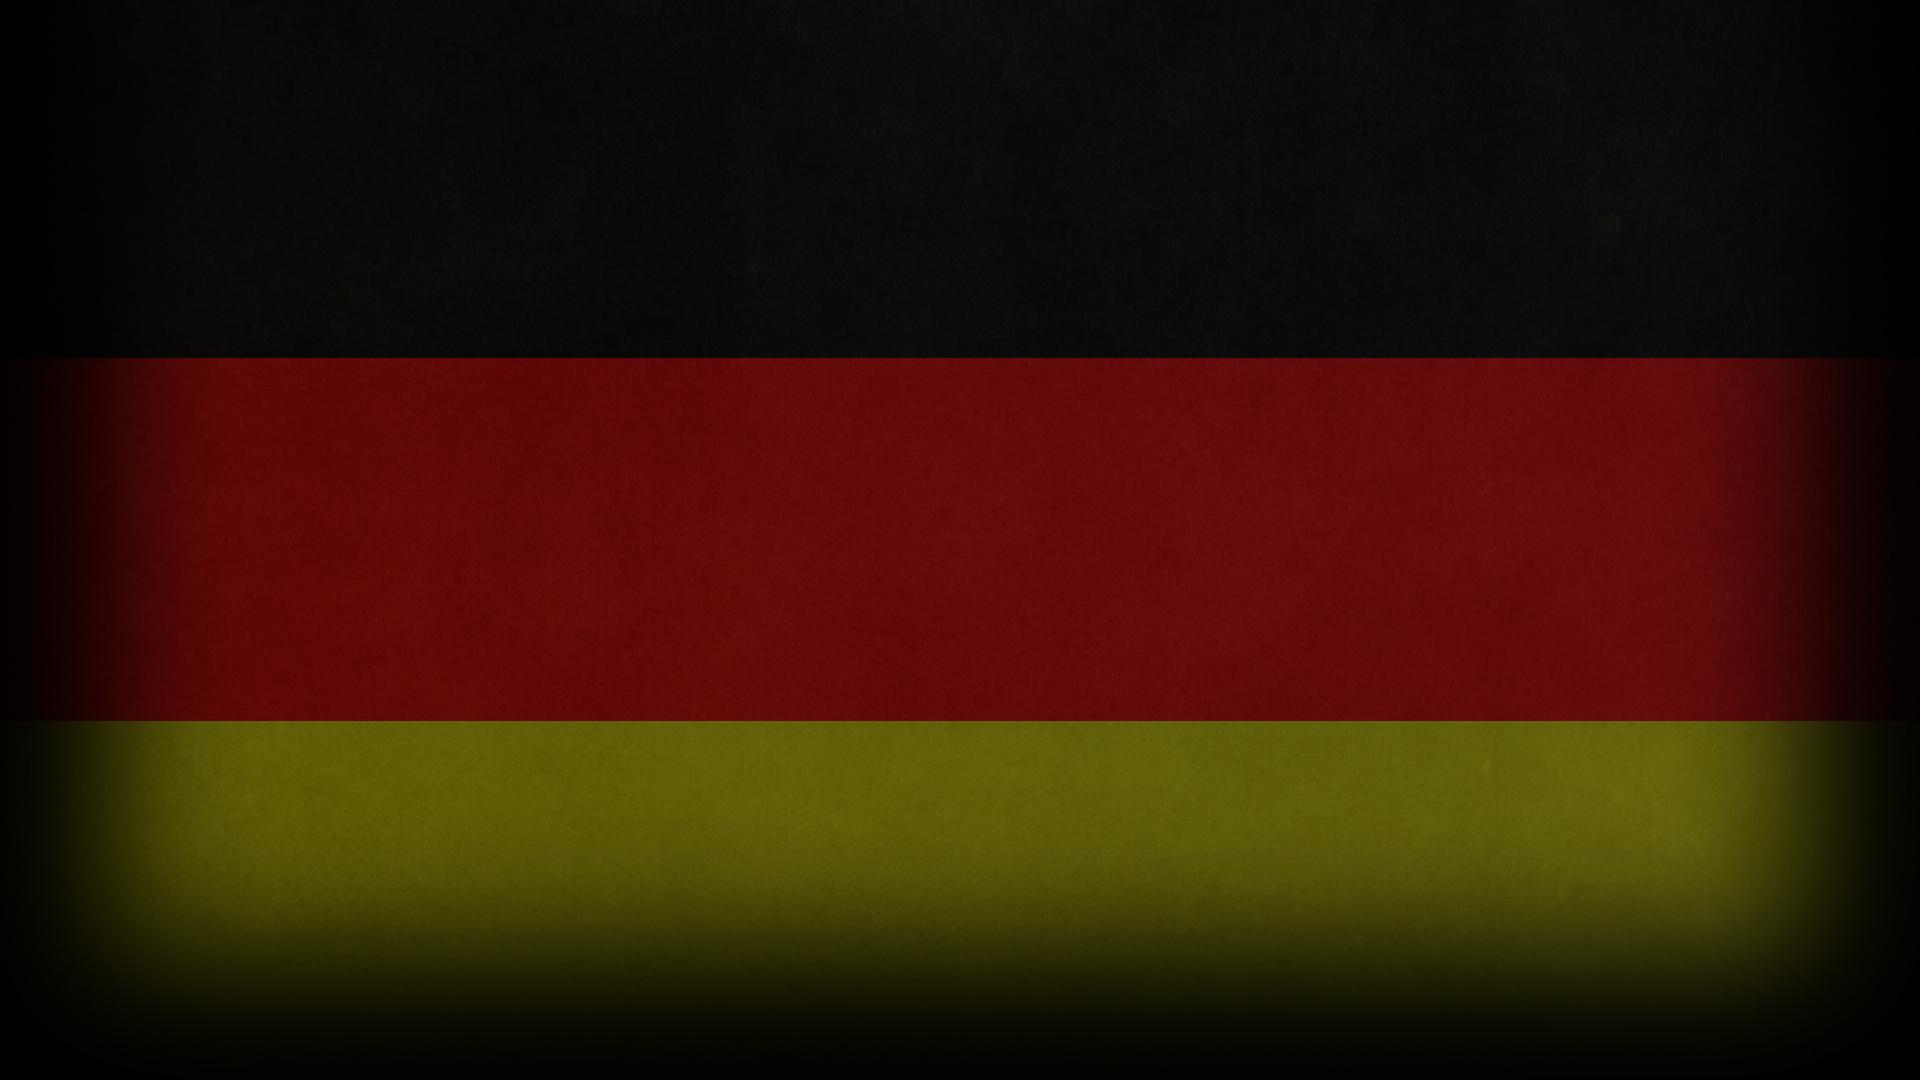 Steam Community Market Listings for 340220 German Flag